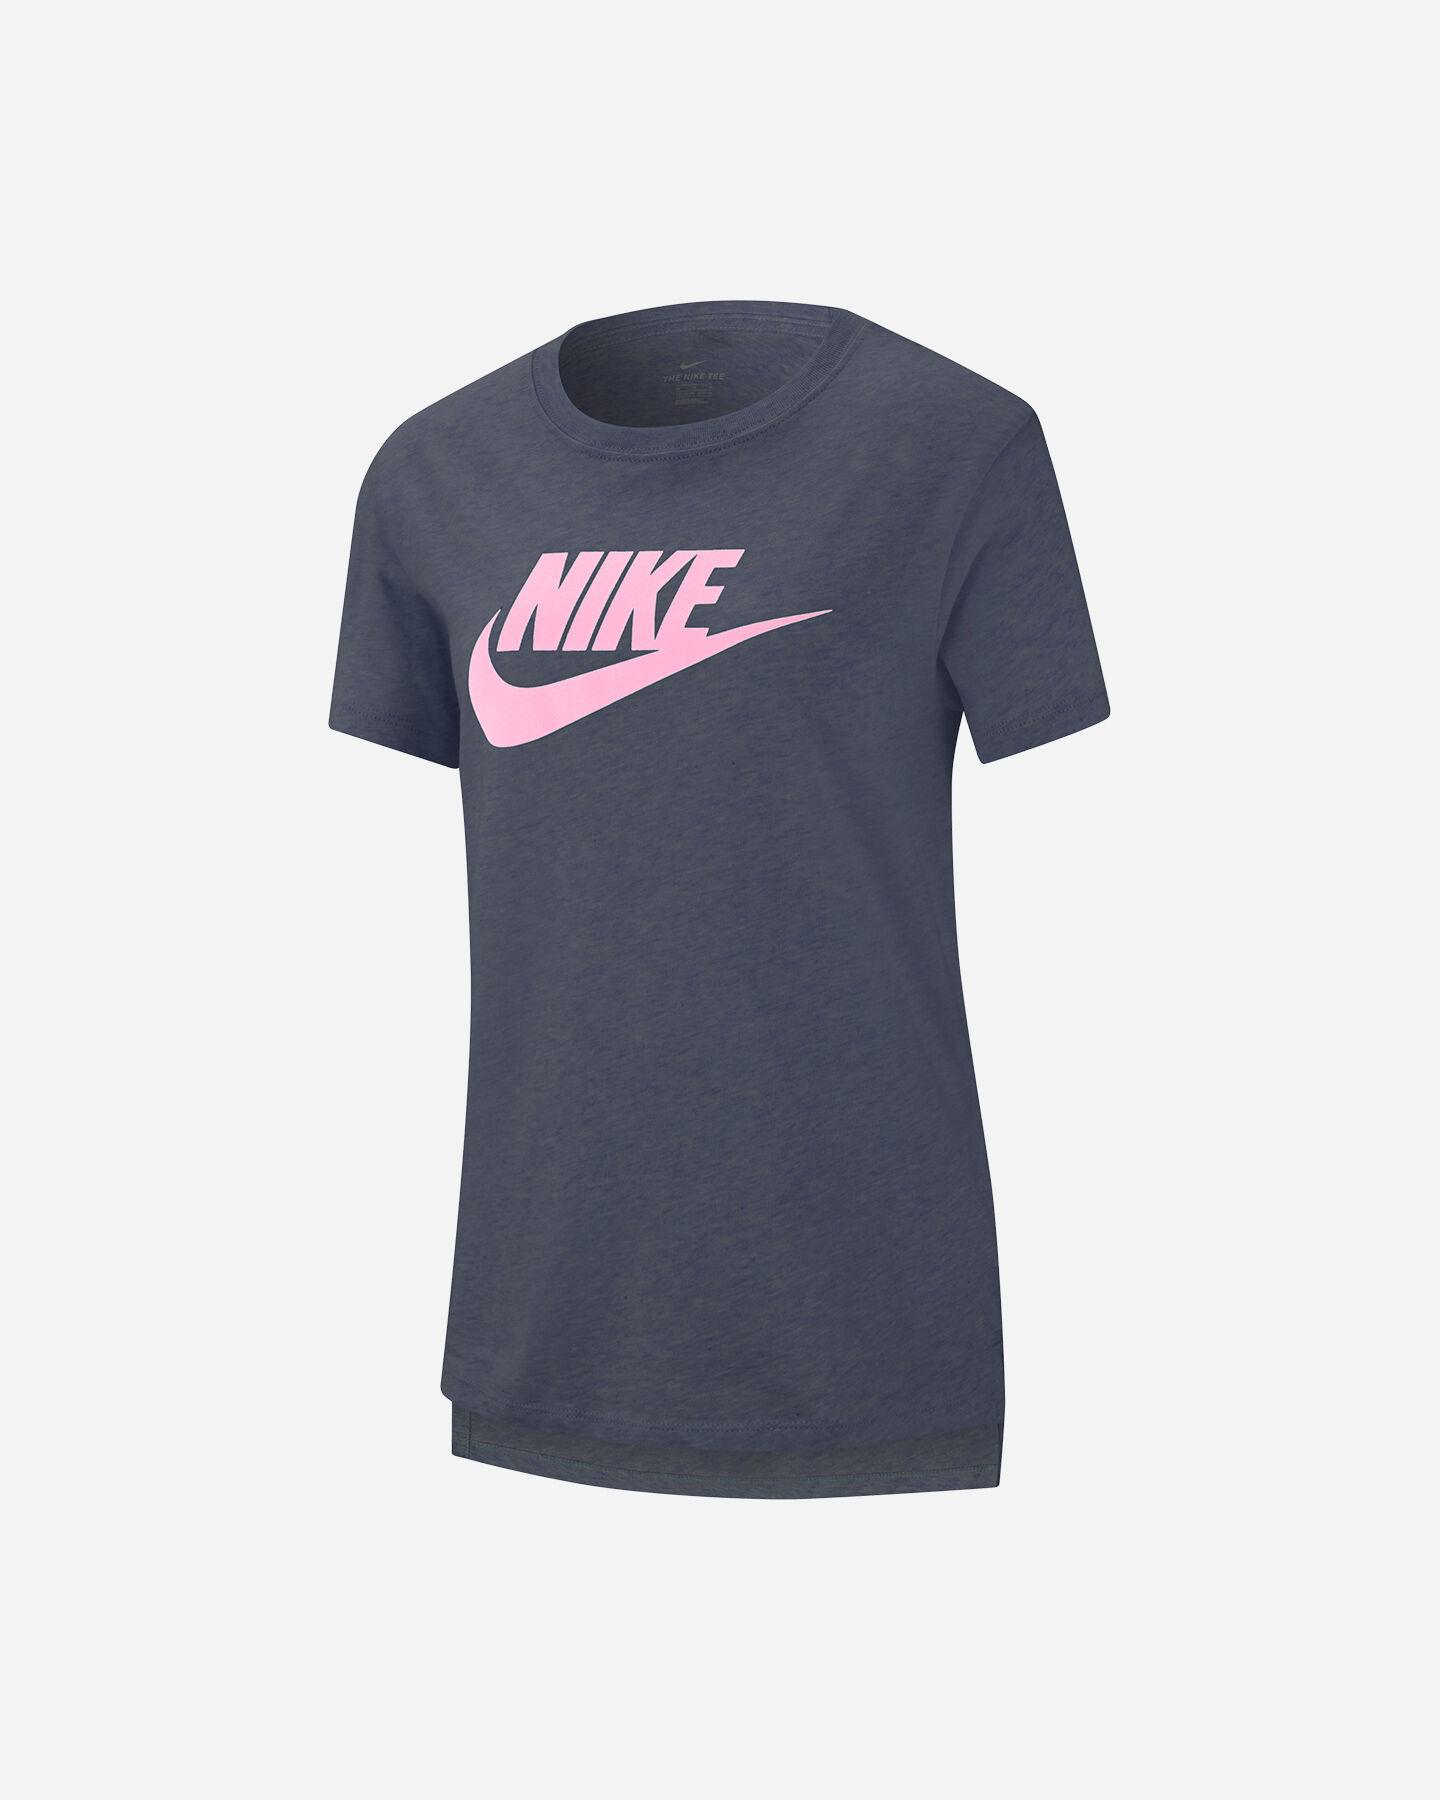 T-Shirt NIKE FUTURA JR S5194934 scatto 0